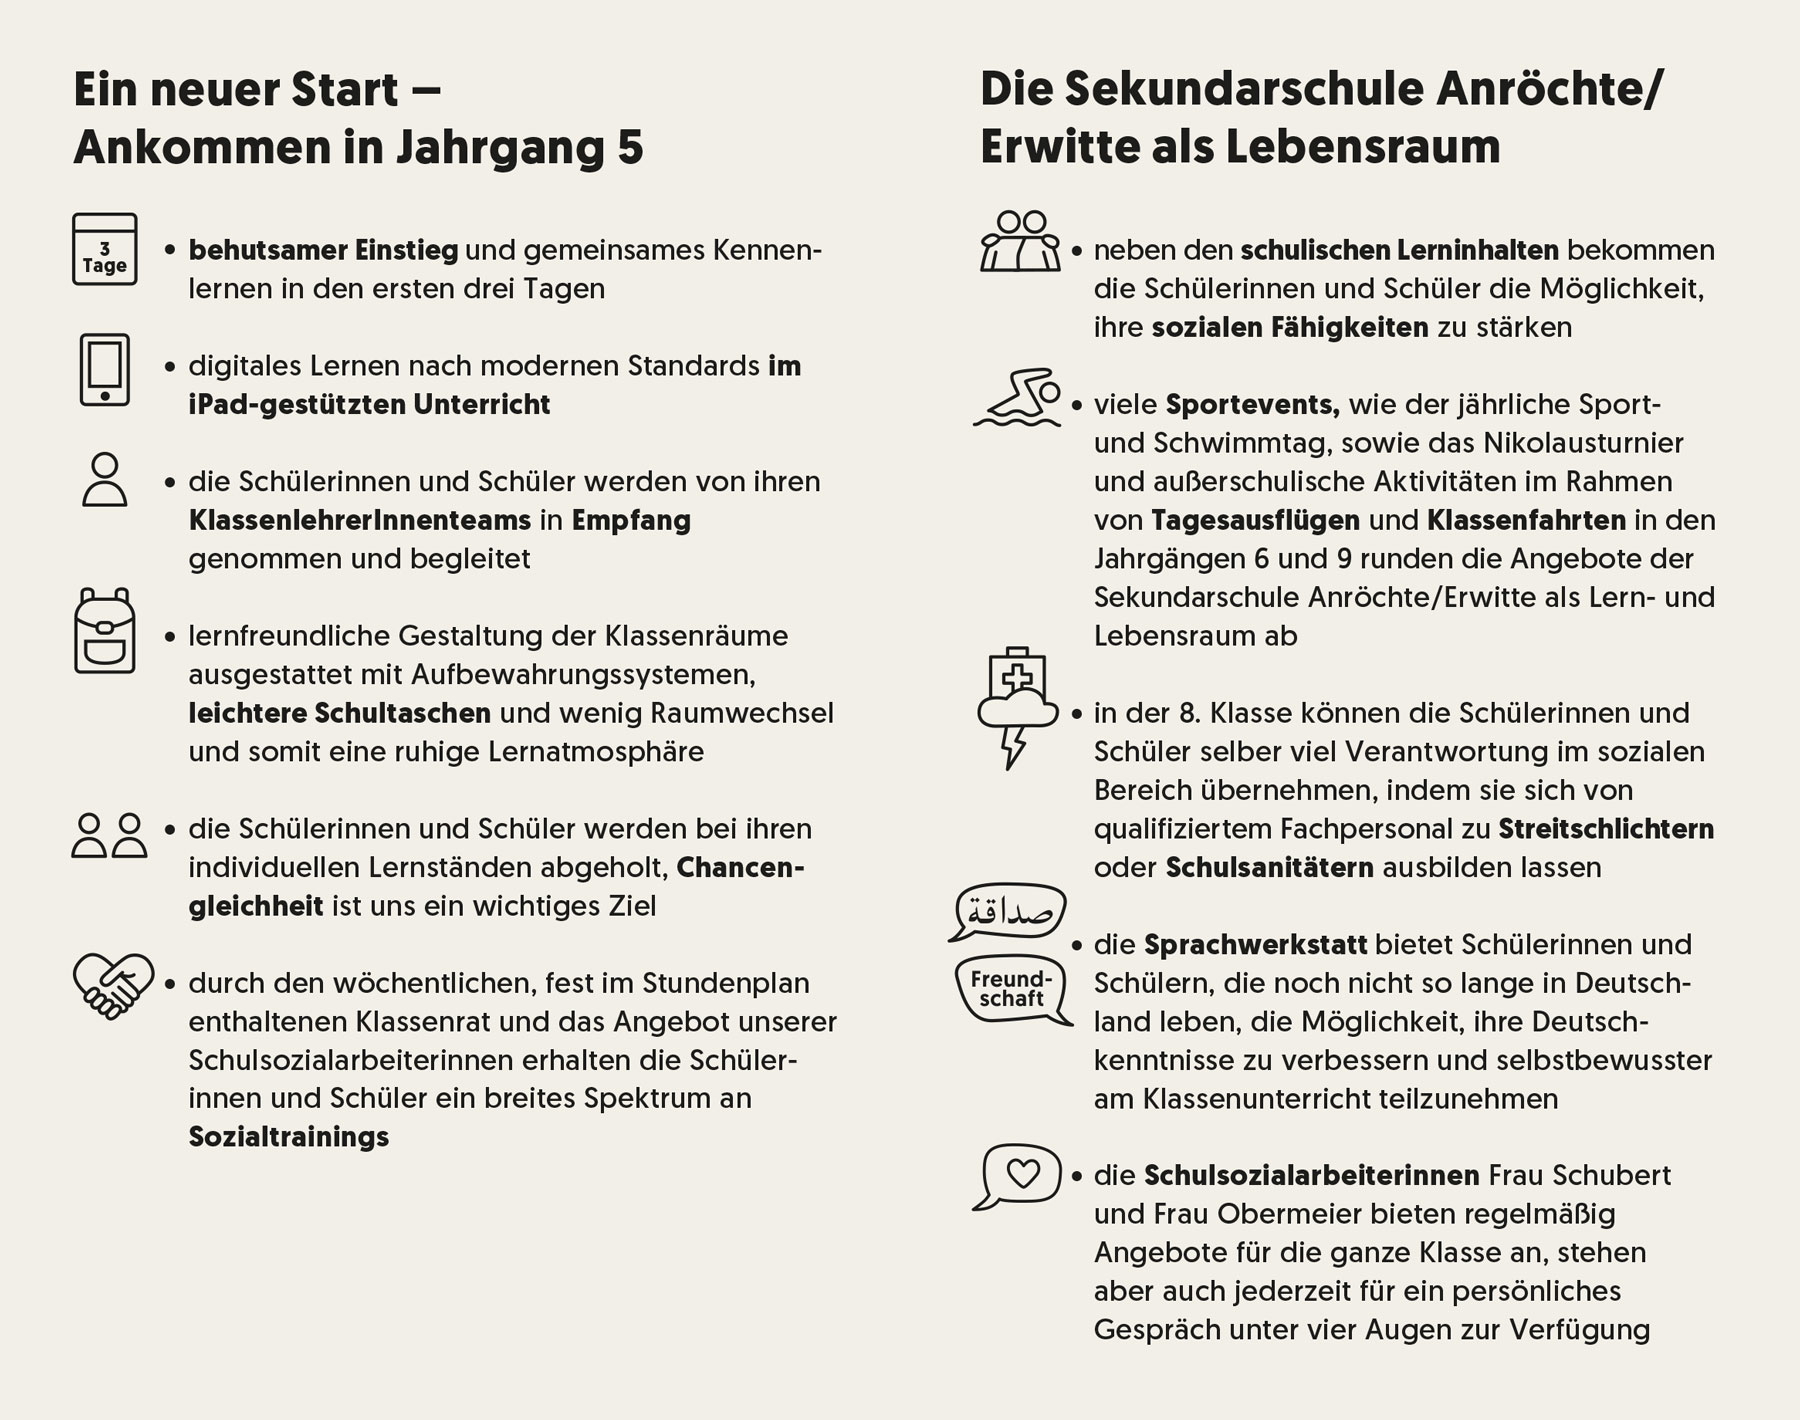 Atilde-Design-Sekundarschule-Piktogramme